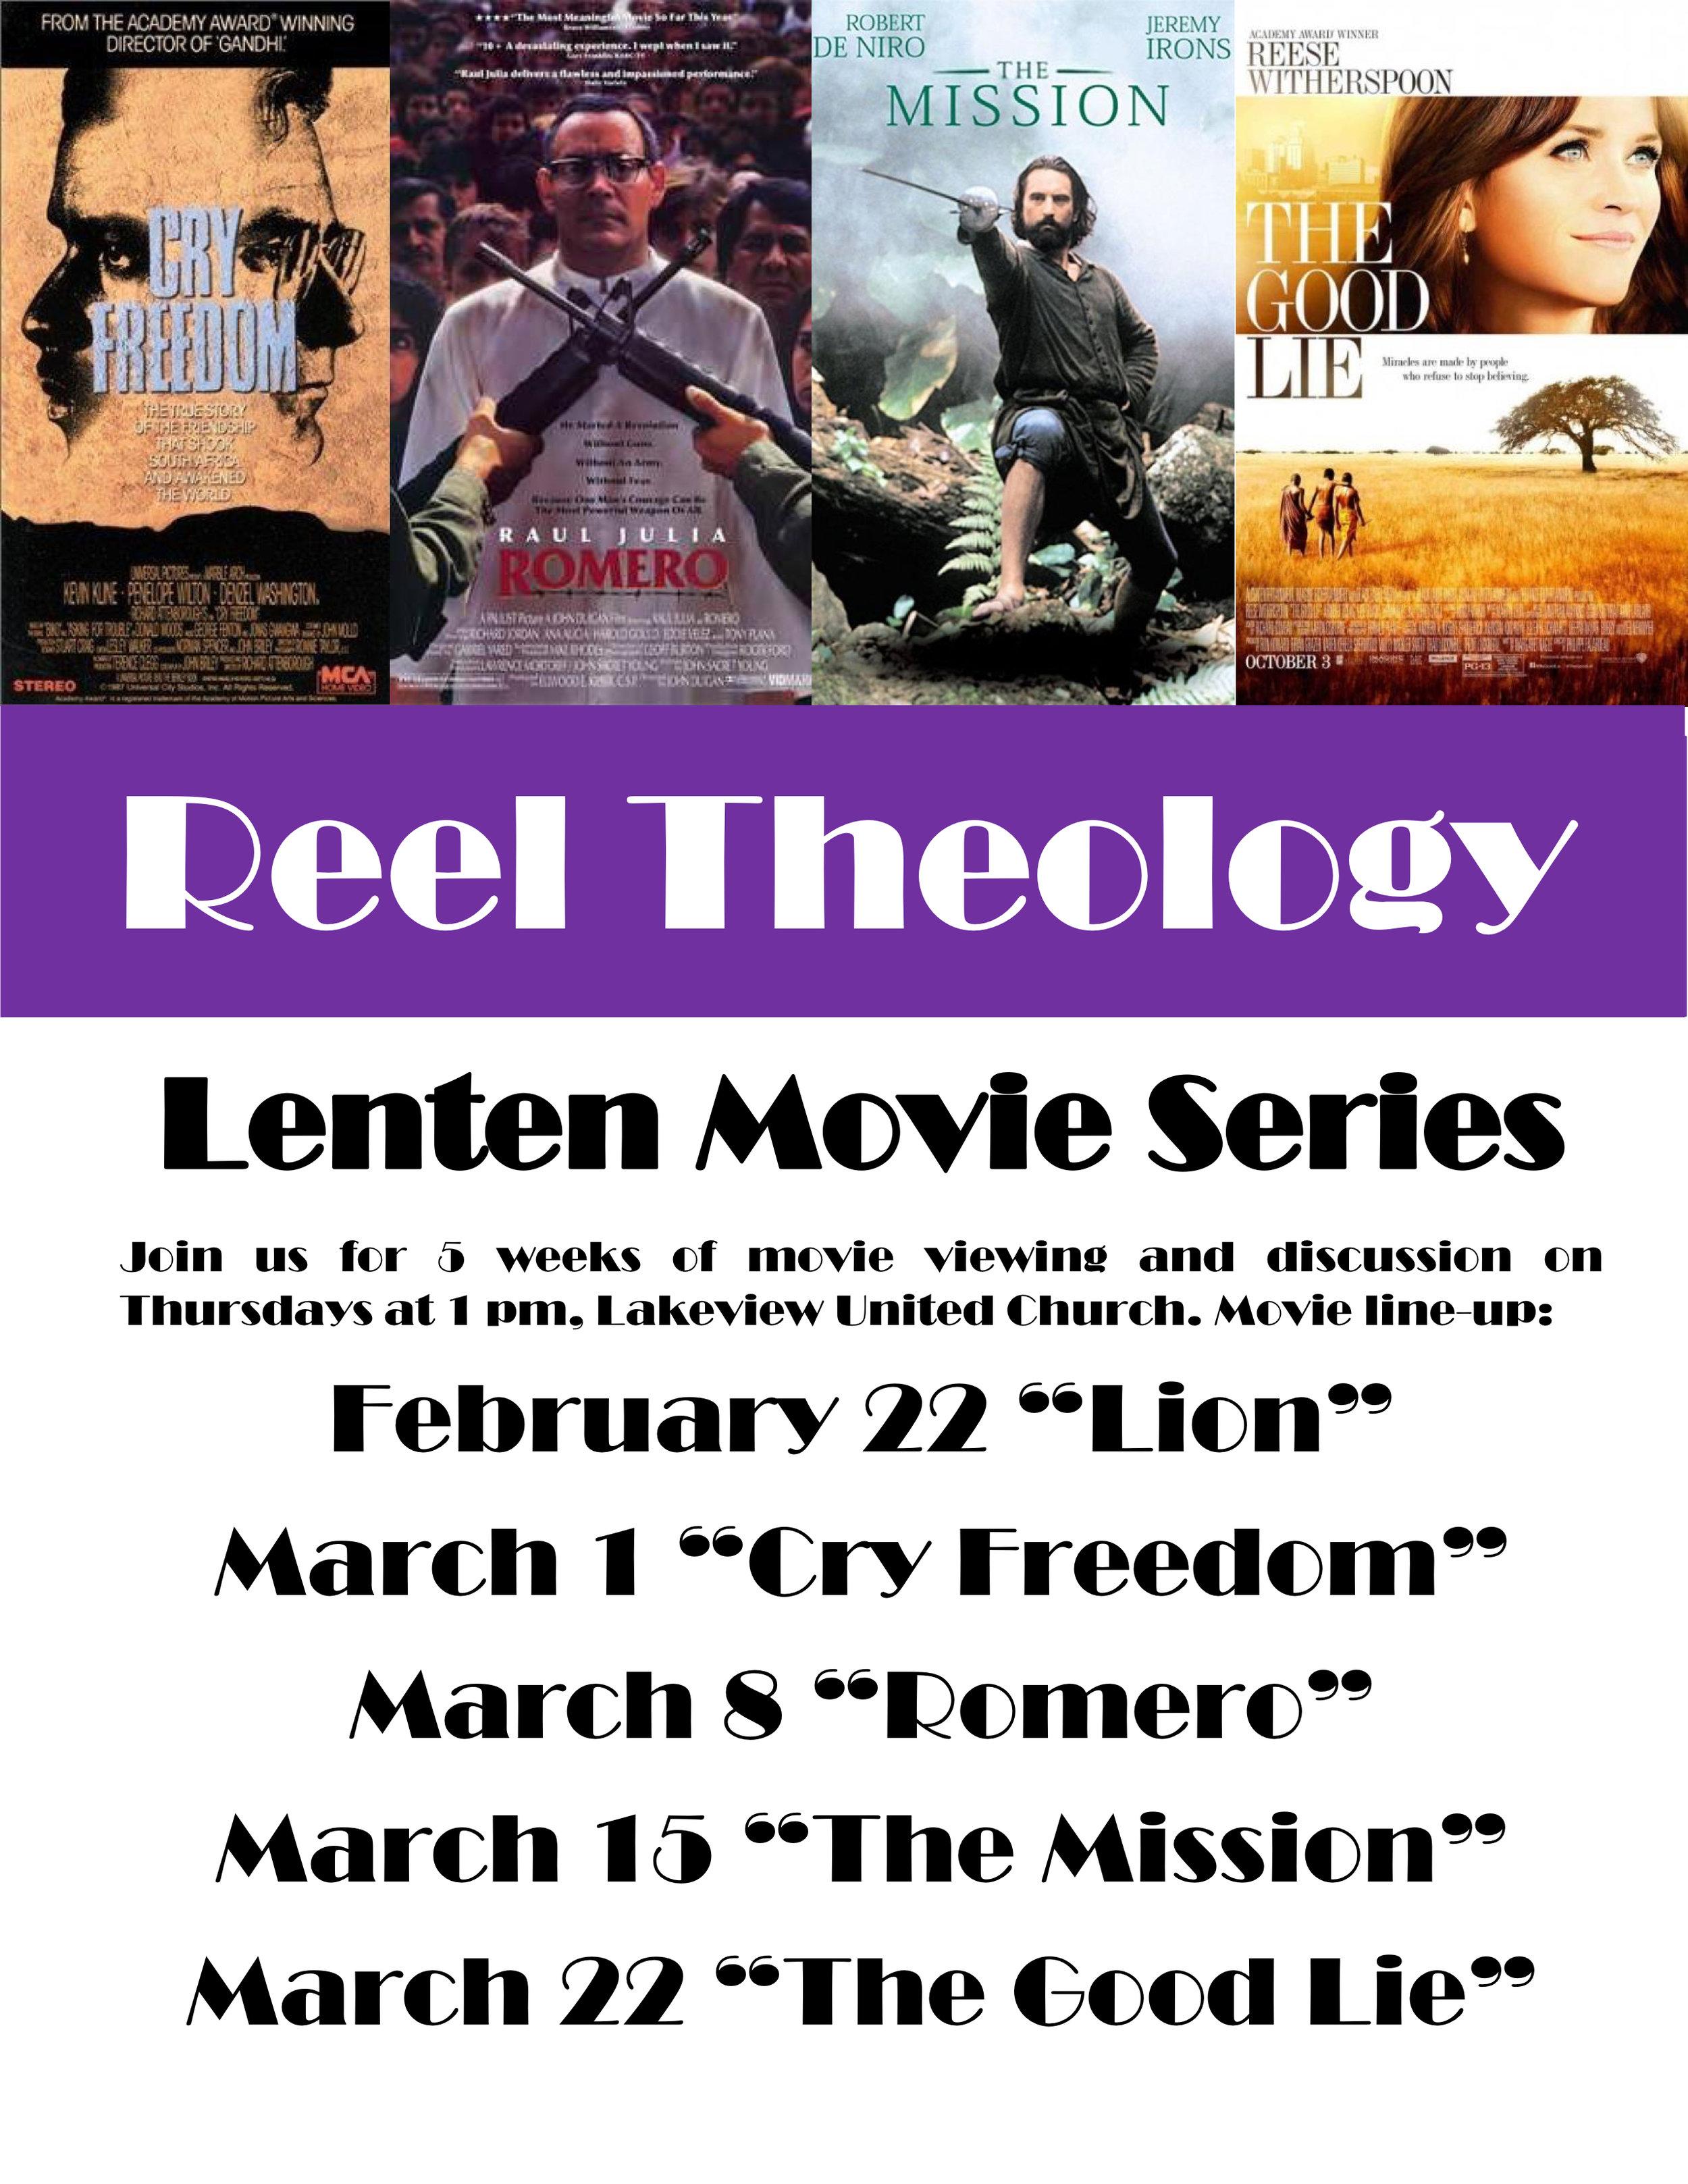 2018+Reel+Theology+Poster+Rev+3.jpg